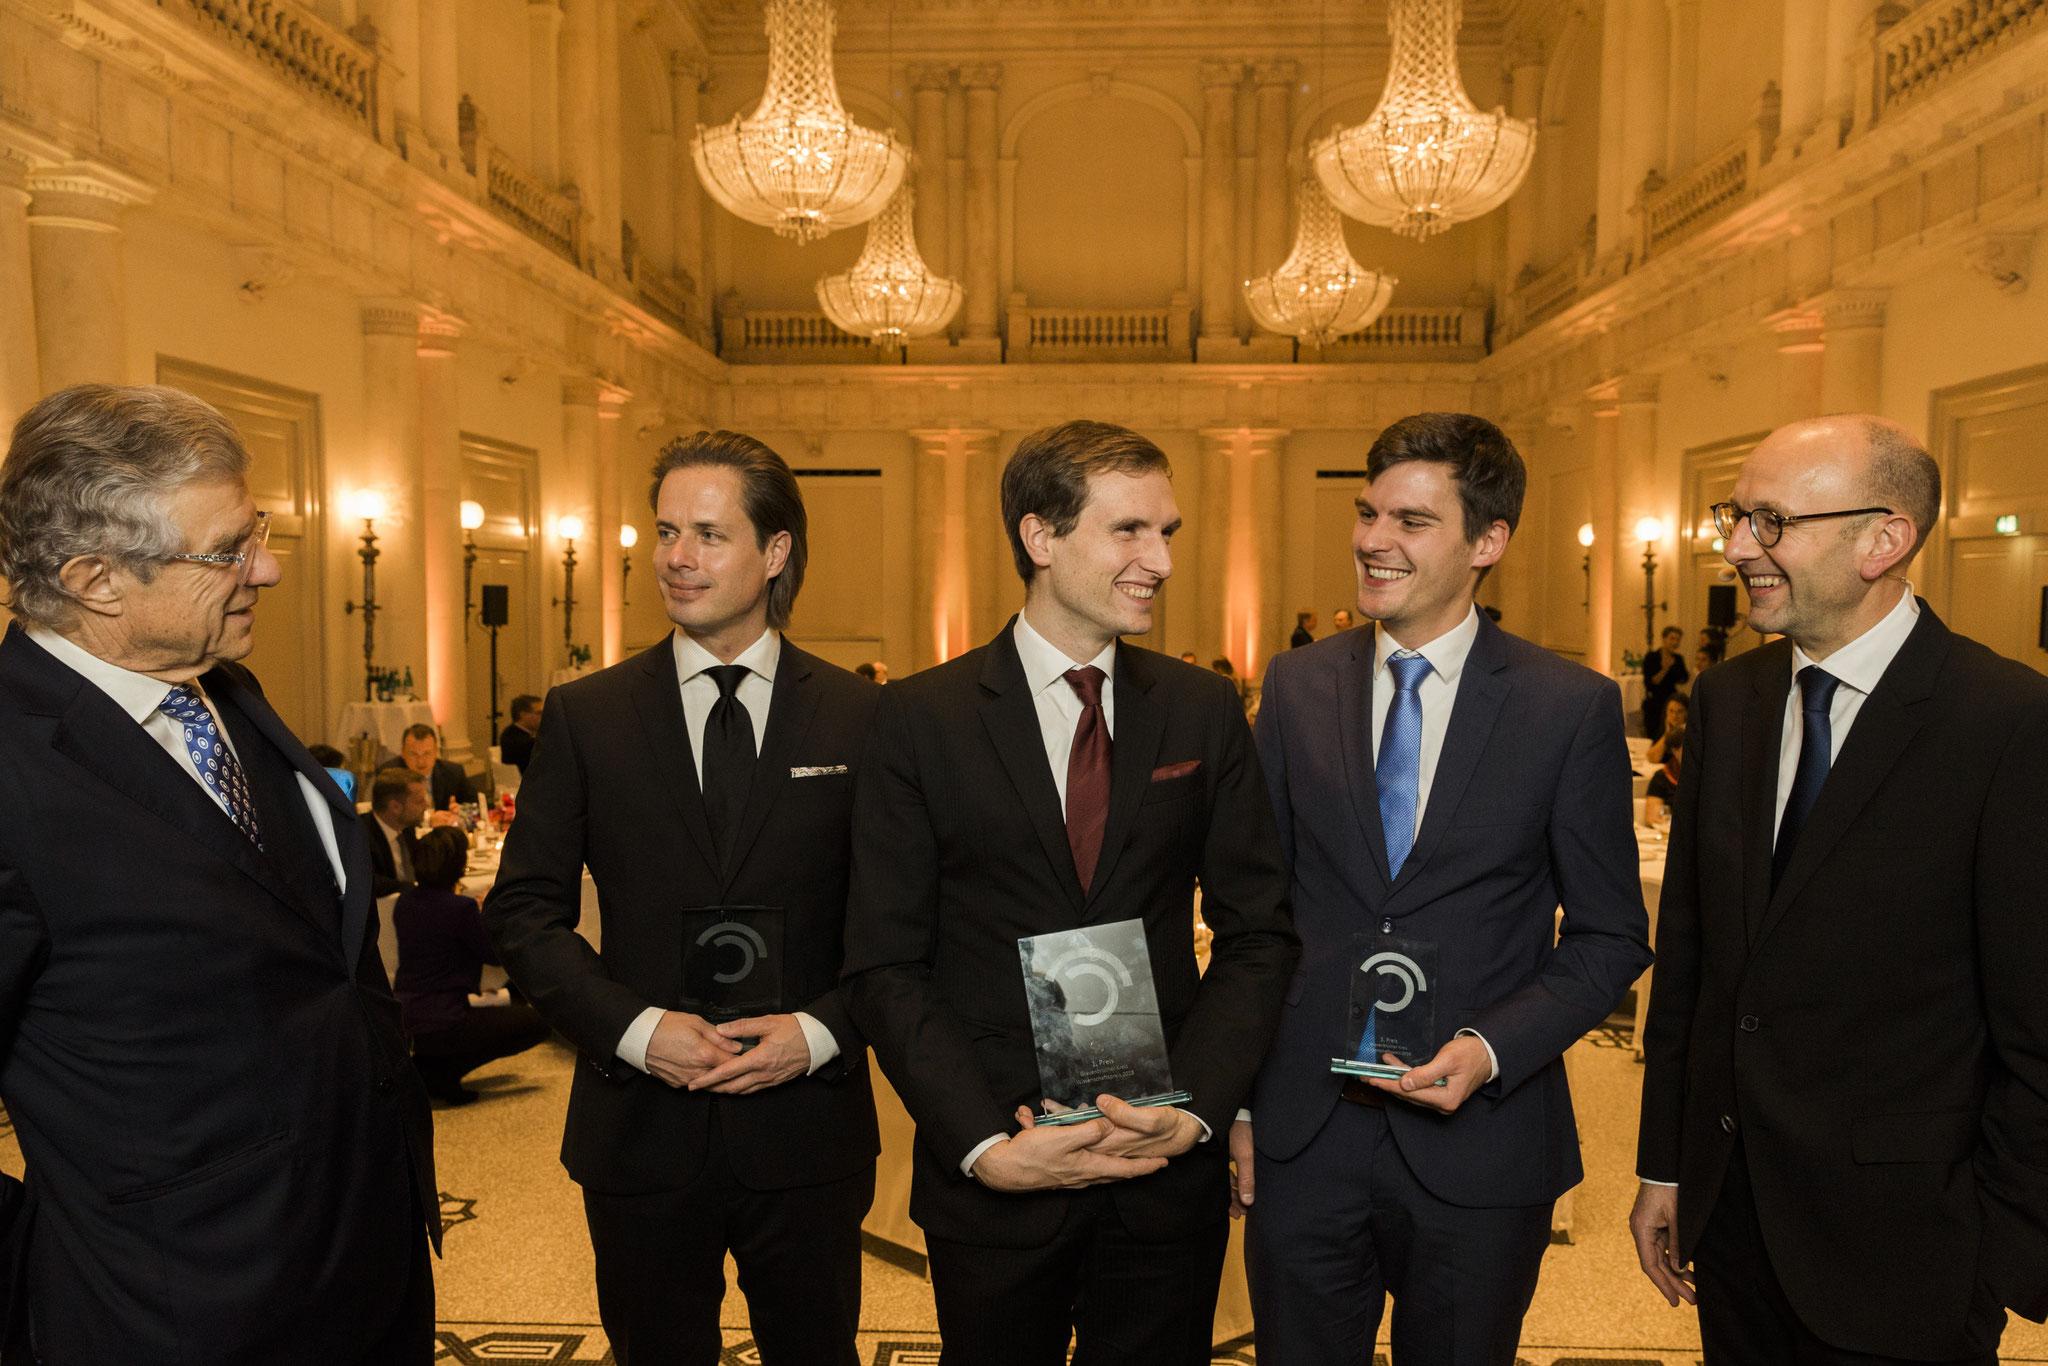 Bruno Kübler, Tilman Rauhut, Patrick Keinert, Johannes Richter, Lucas Flöther. Prize-winners and laudators Research Prize © 2018 Sven Döring